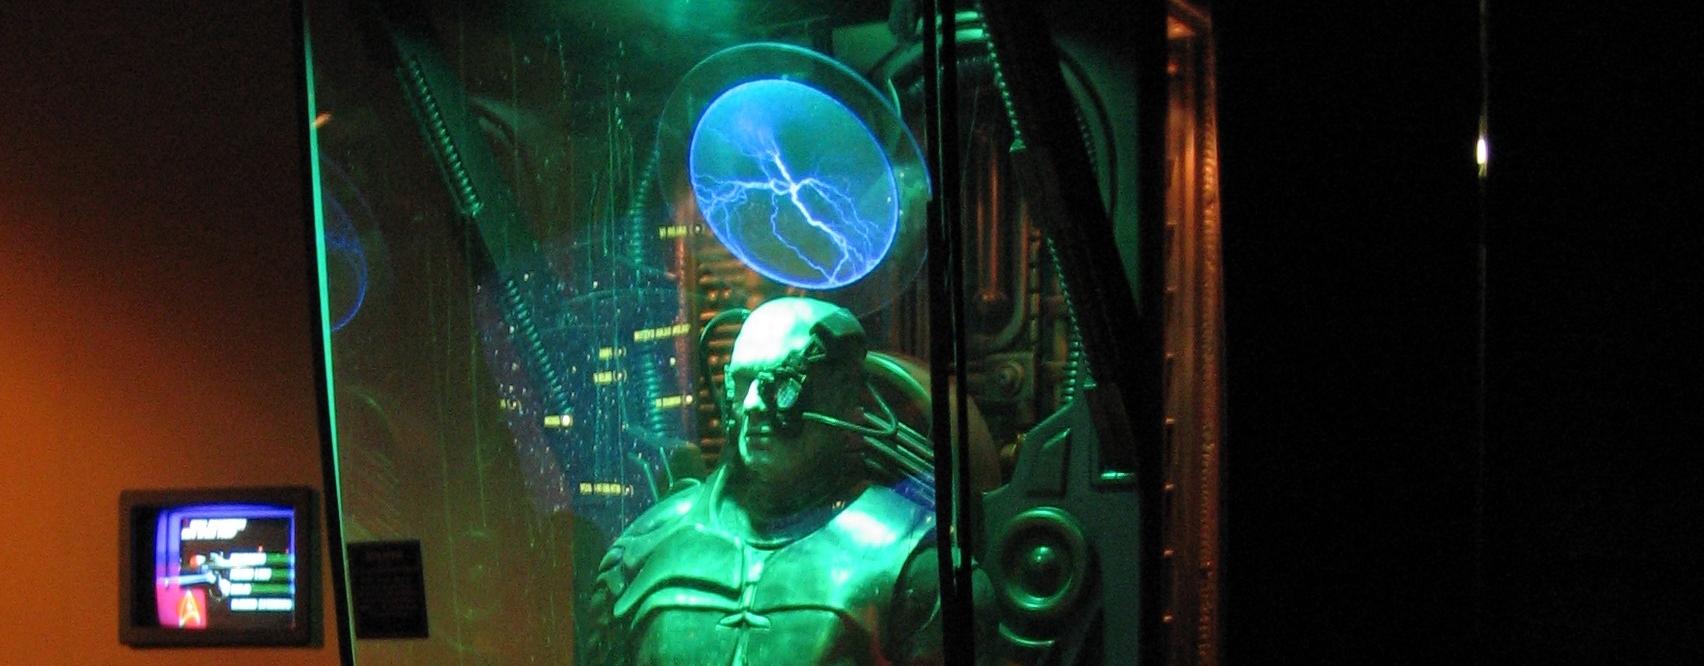 Un borg (Star Trek) dans sa station de stockage